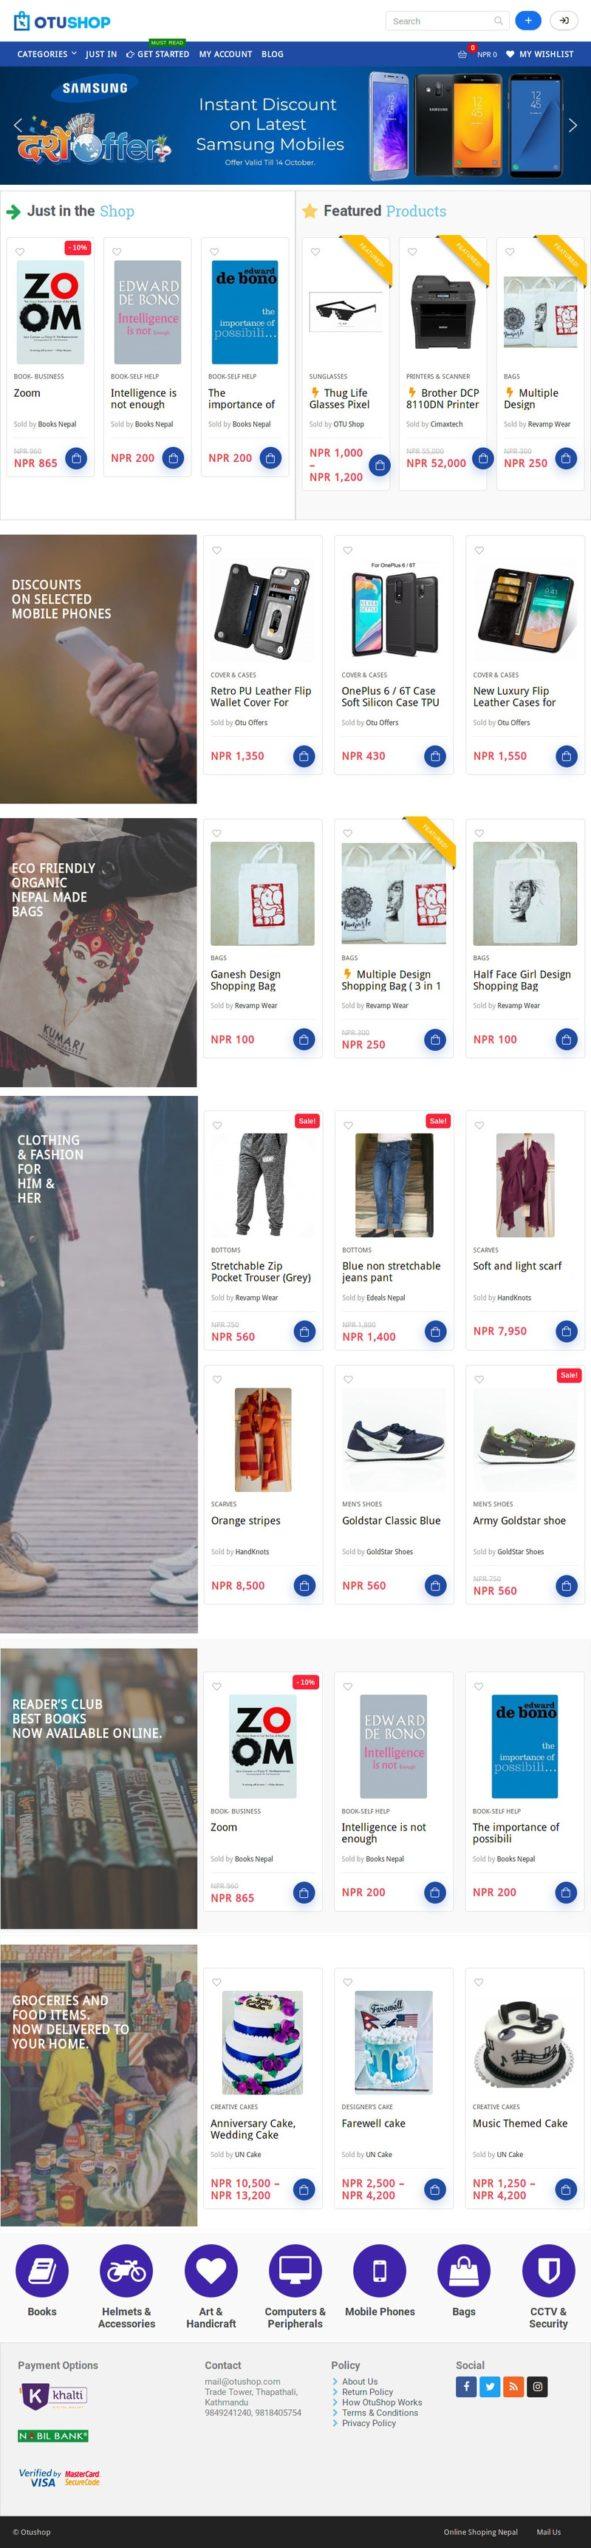 OtuShop.com - eCommerce website